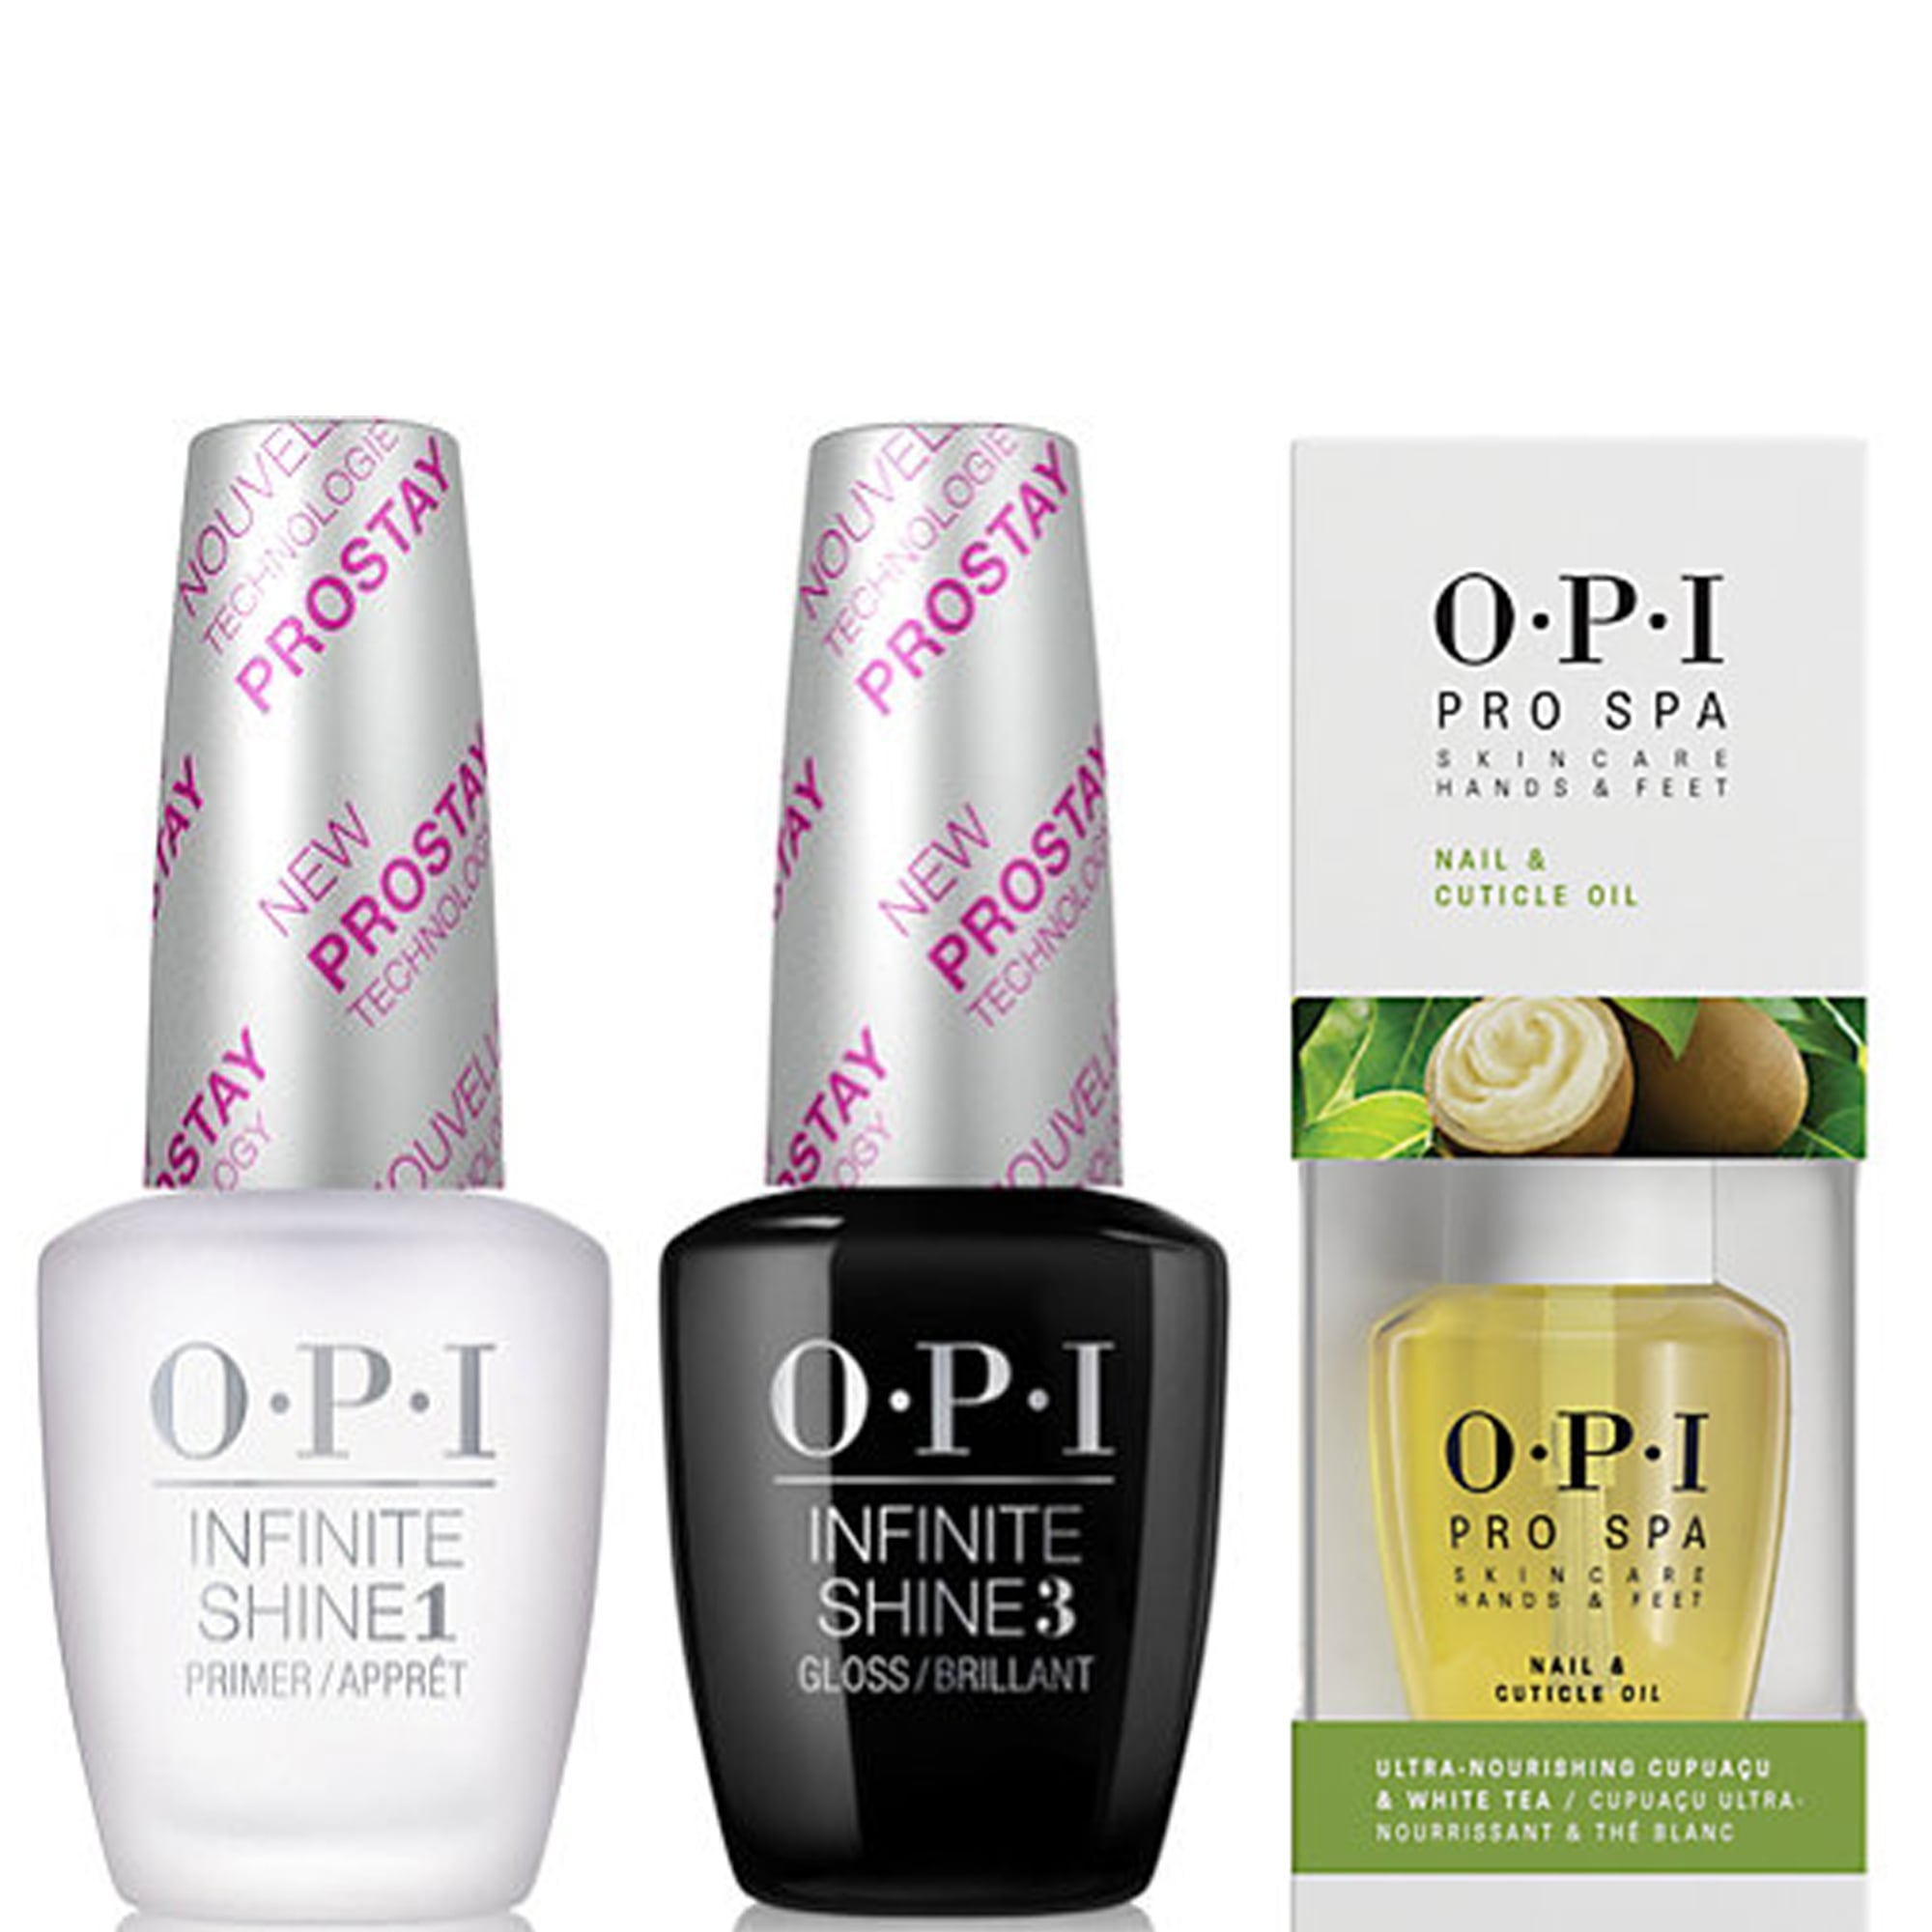 OPI Natural Top & Base Coat - Pro Spa Cuticle Oil Set 2x 15ml & 14.8ml